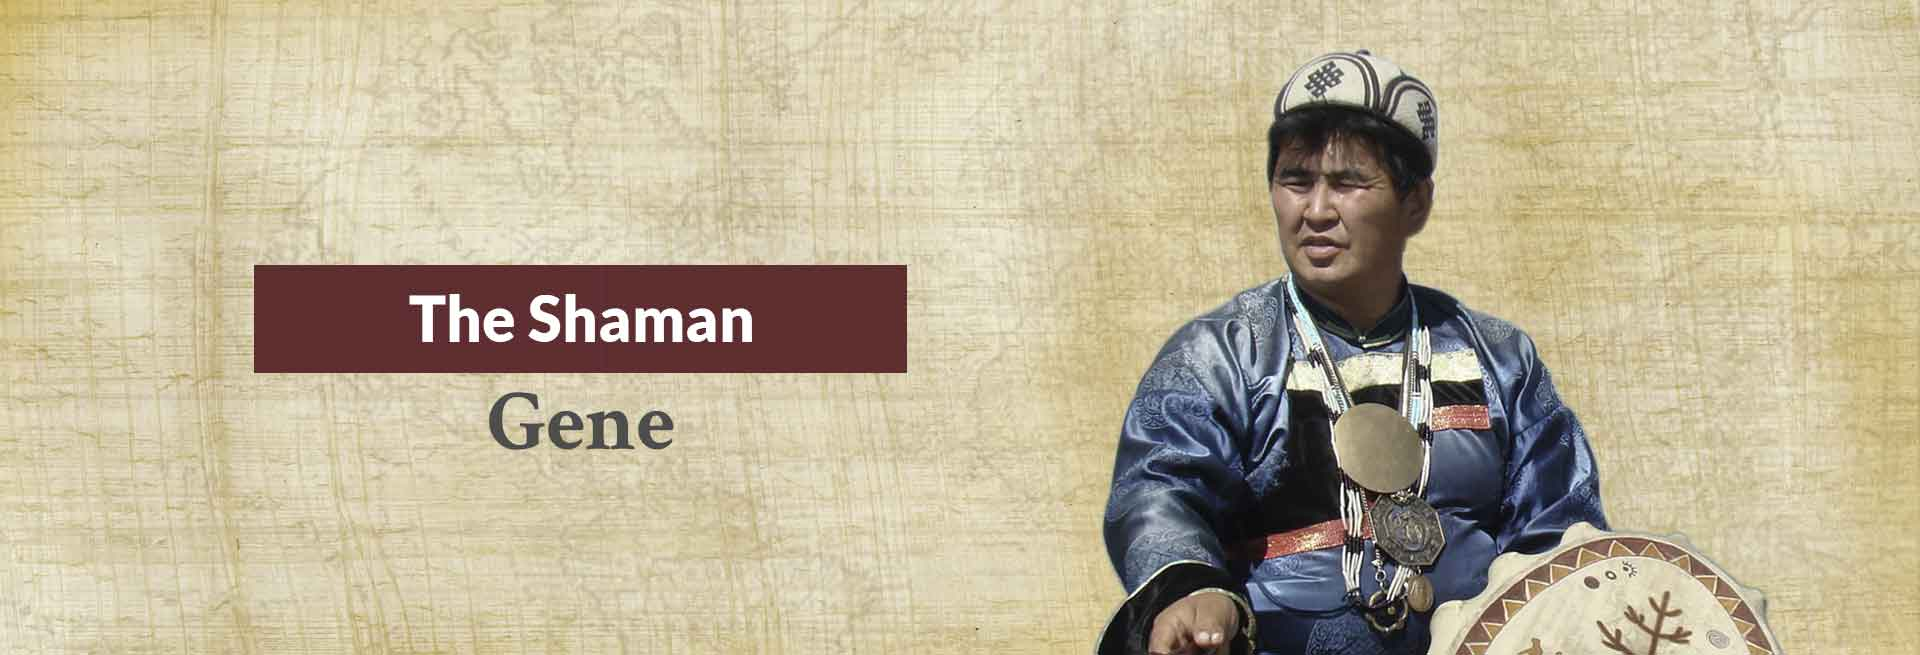 The Shaman Gene Banner